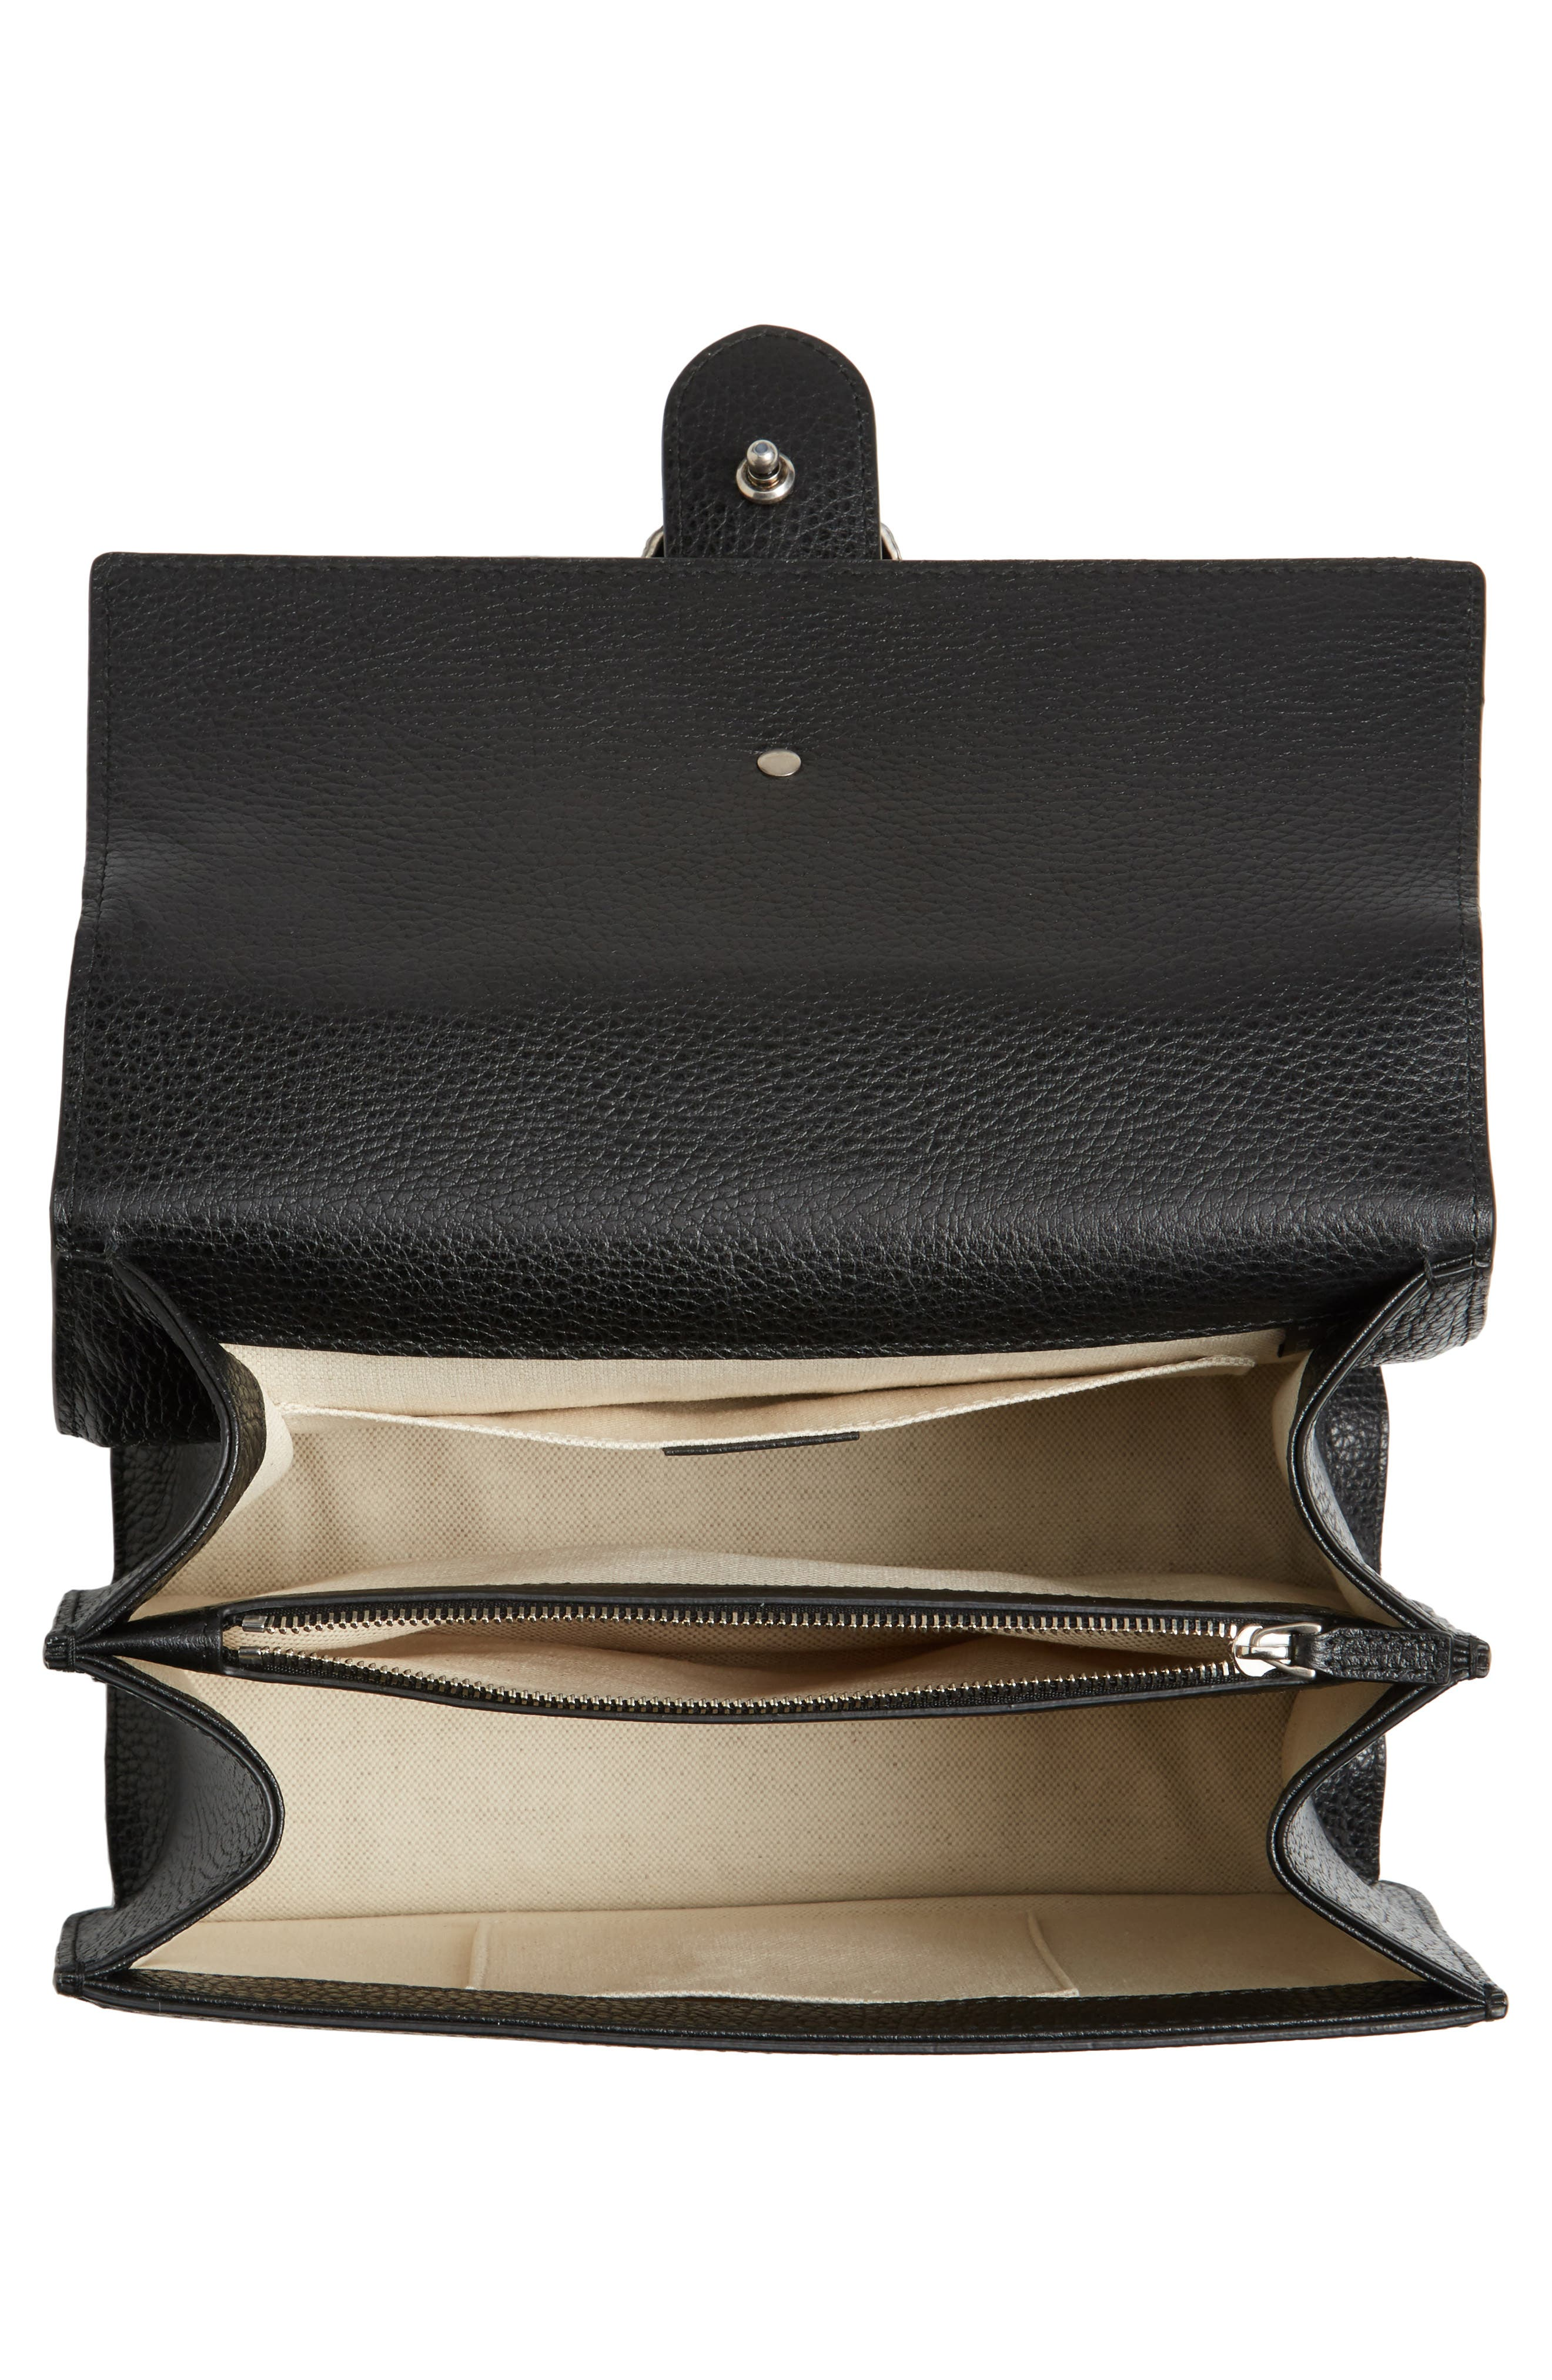 Medium Dionysus Leather Top Handle Satchel,                             Alternate thumbnail 4, color,                             Nero/ Vrv/ Black Diamond